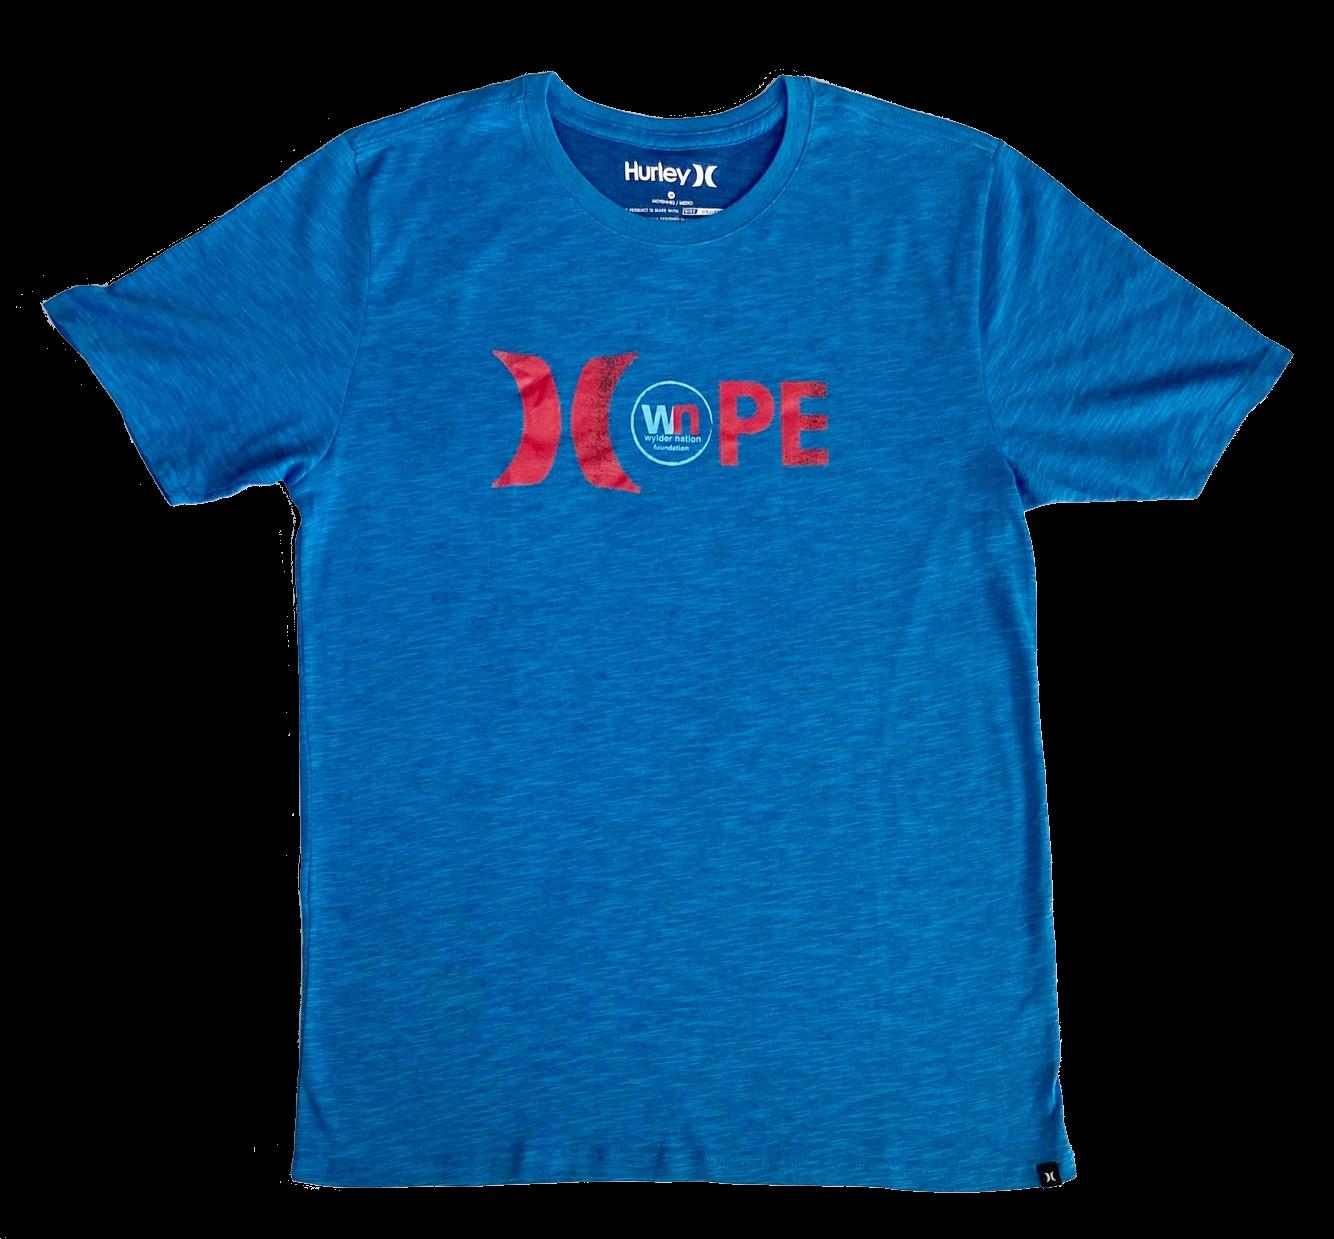 WN/Hurley Hope Royal Blue Unisex Premium Dri-Fit T-Shirt